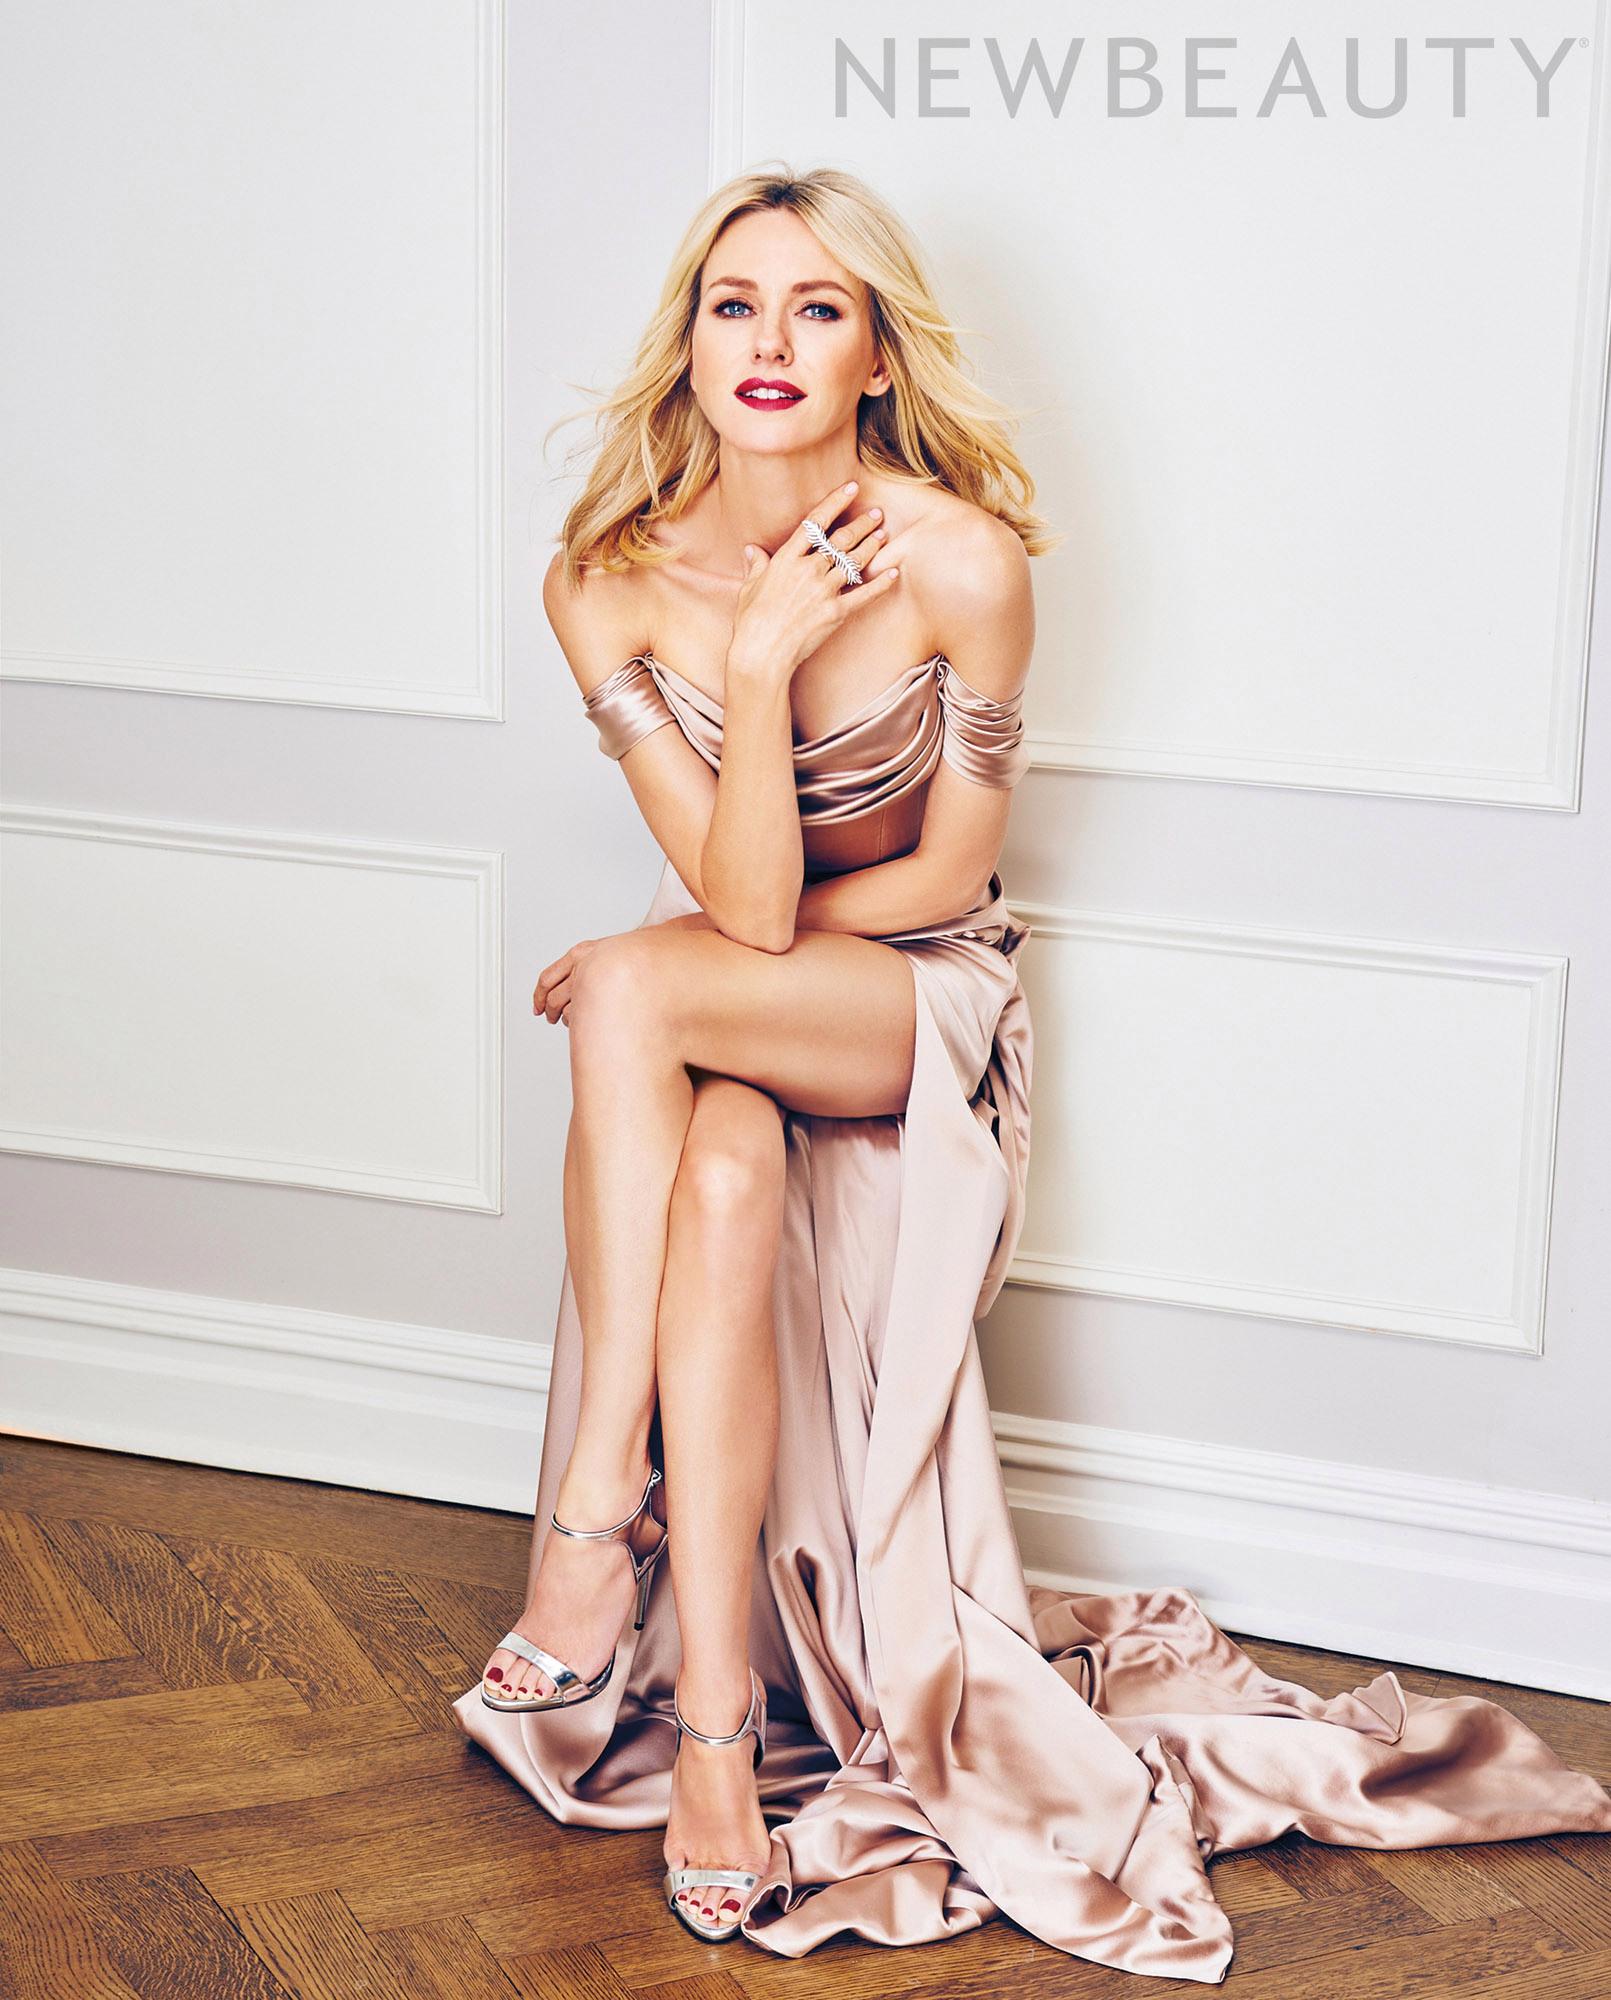 Naomi Watts - New Beauty Magazine (Spring/Summer 2016)